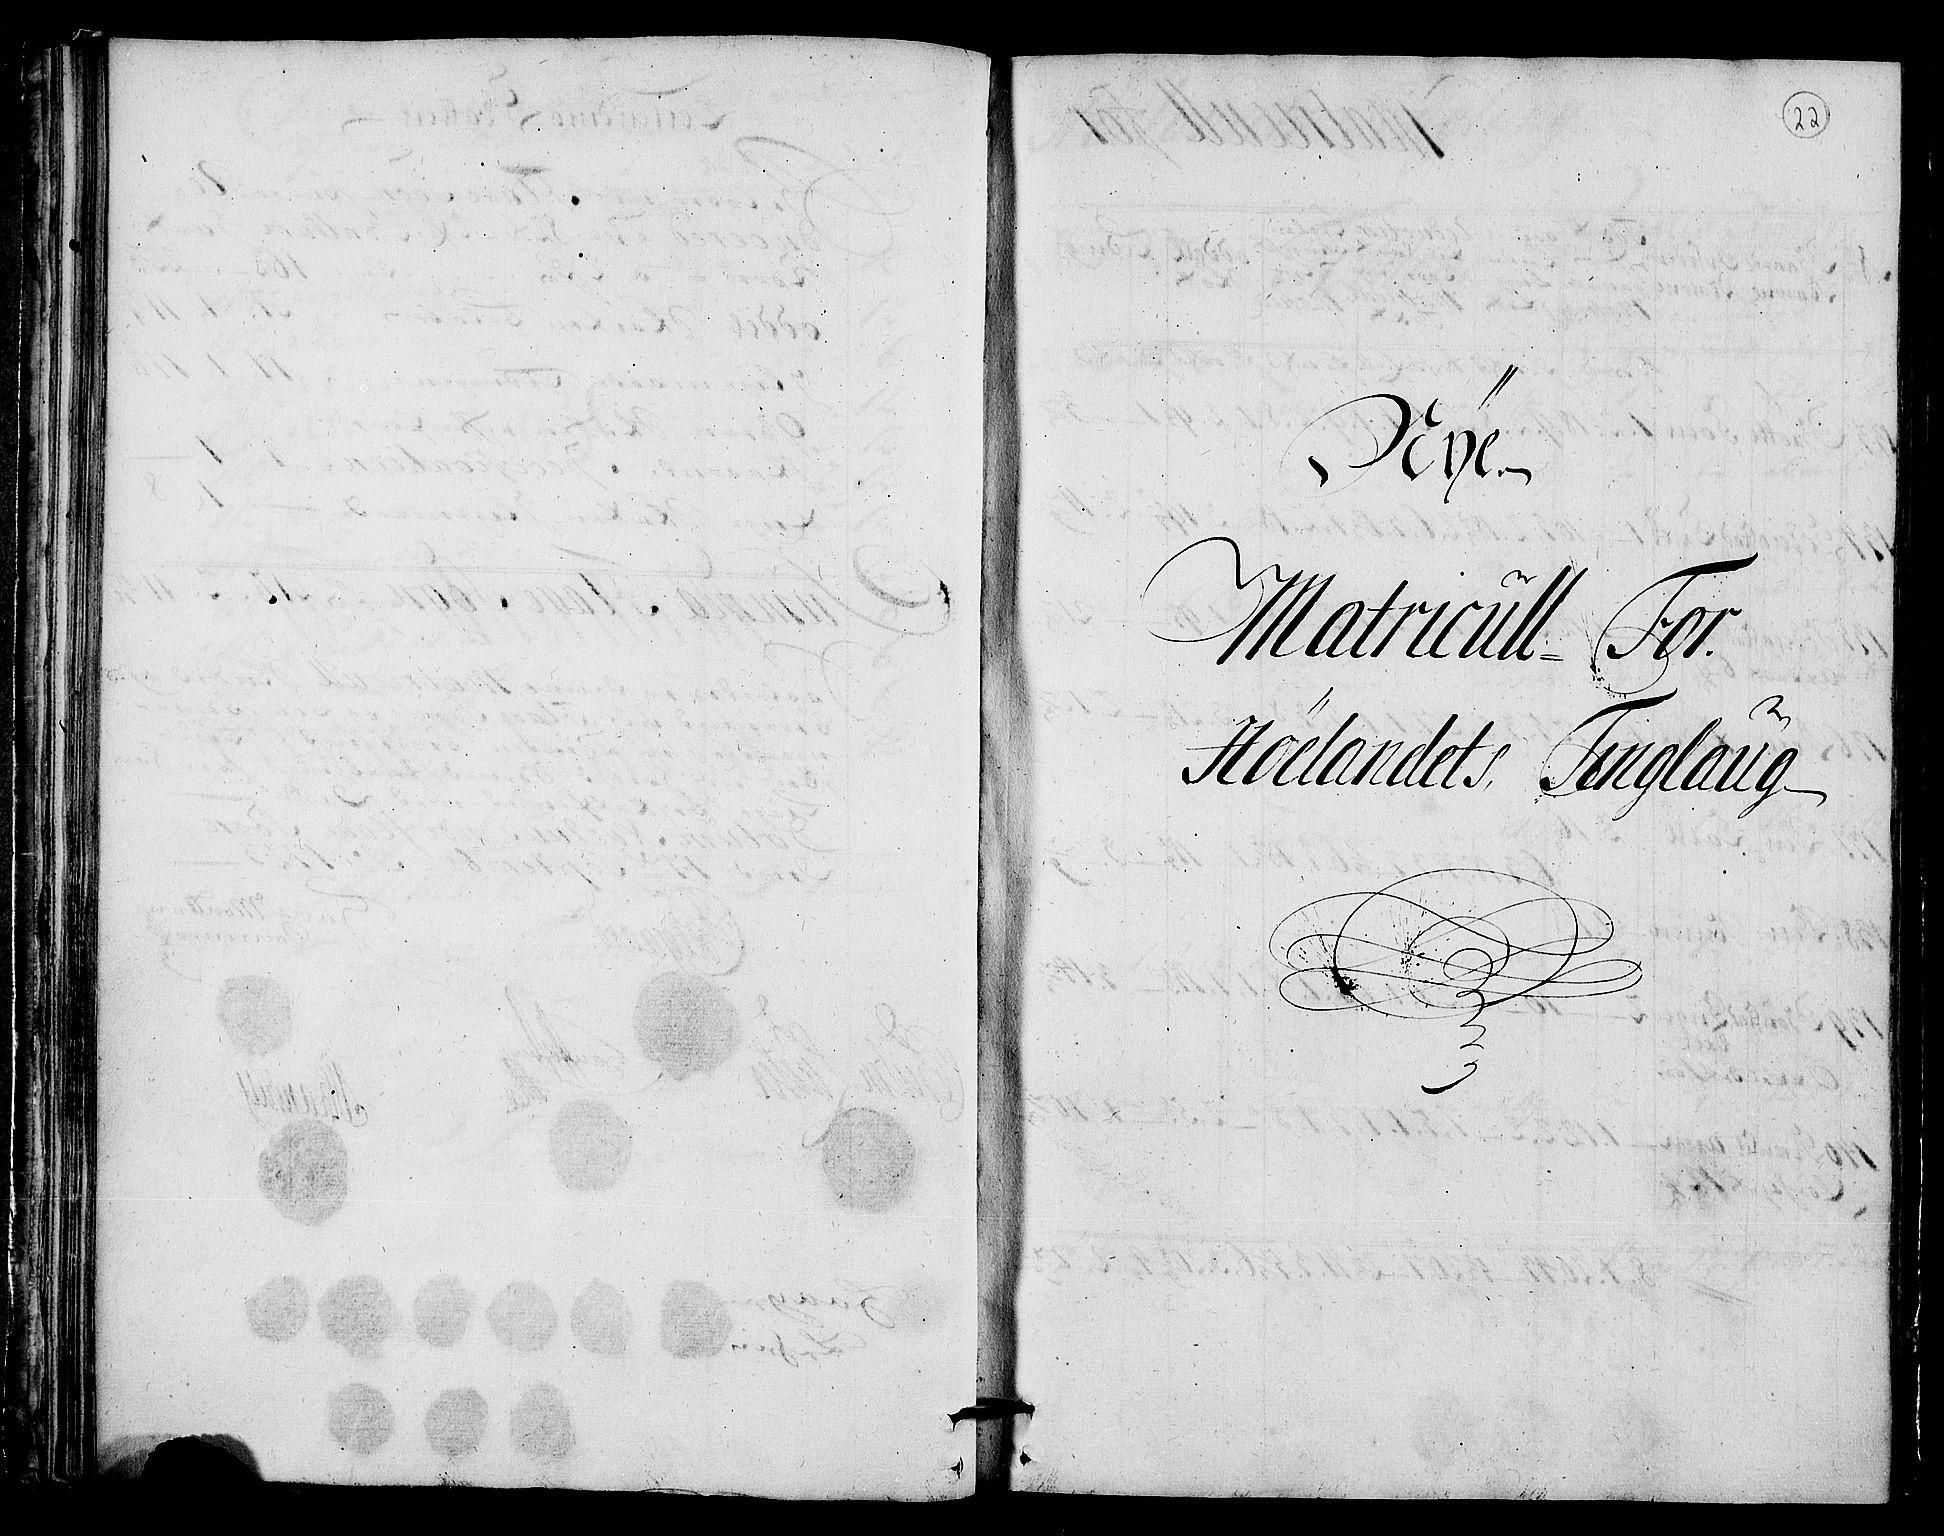 RA, Rentekammeret inntil 1814, Realistisk ordnet avdeling, N/Nb/Nbf/L0159: Gauldal matrikkelprotokoll, 1723, s. 21b-22a